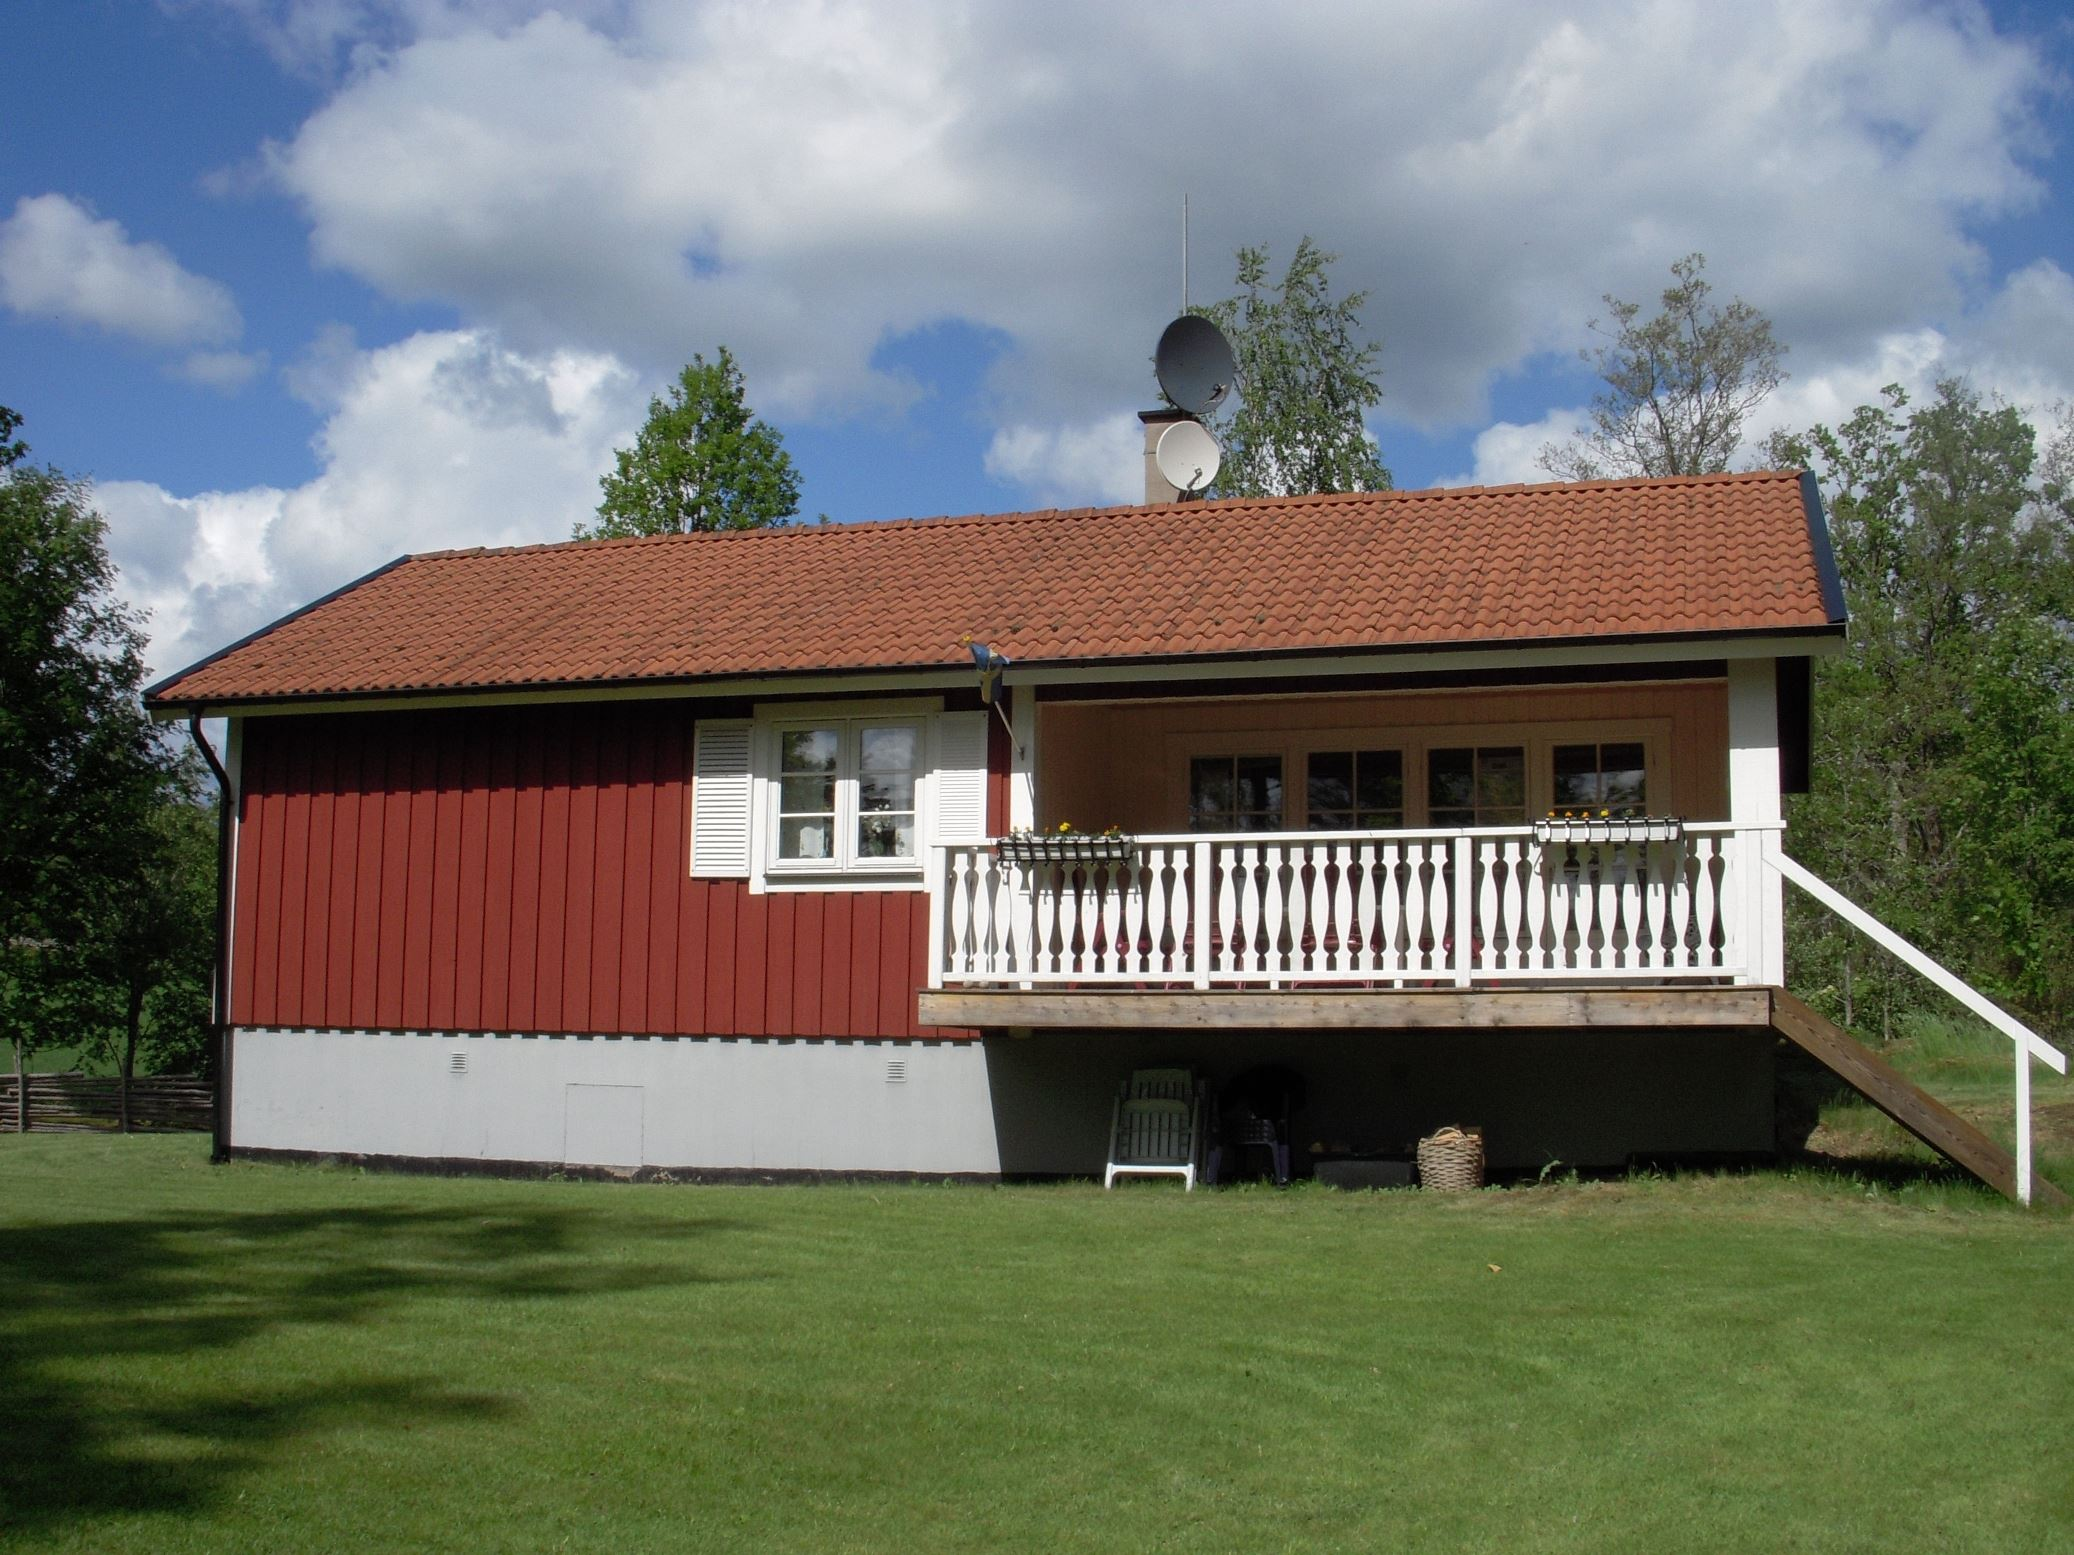 FS85066 Ängslyckan, Skirö